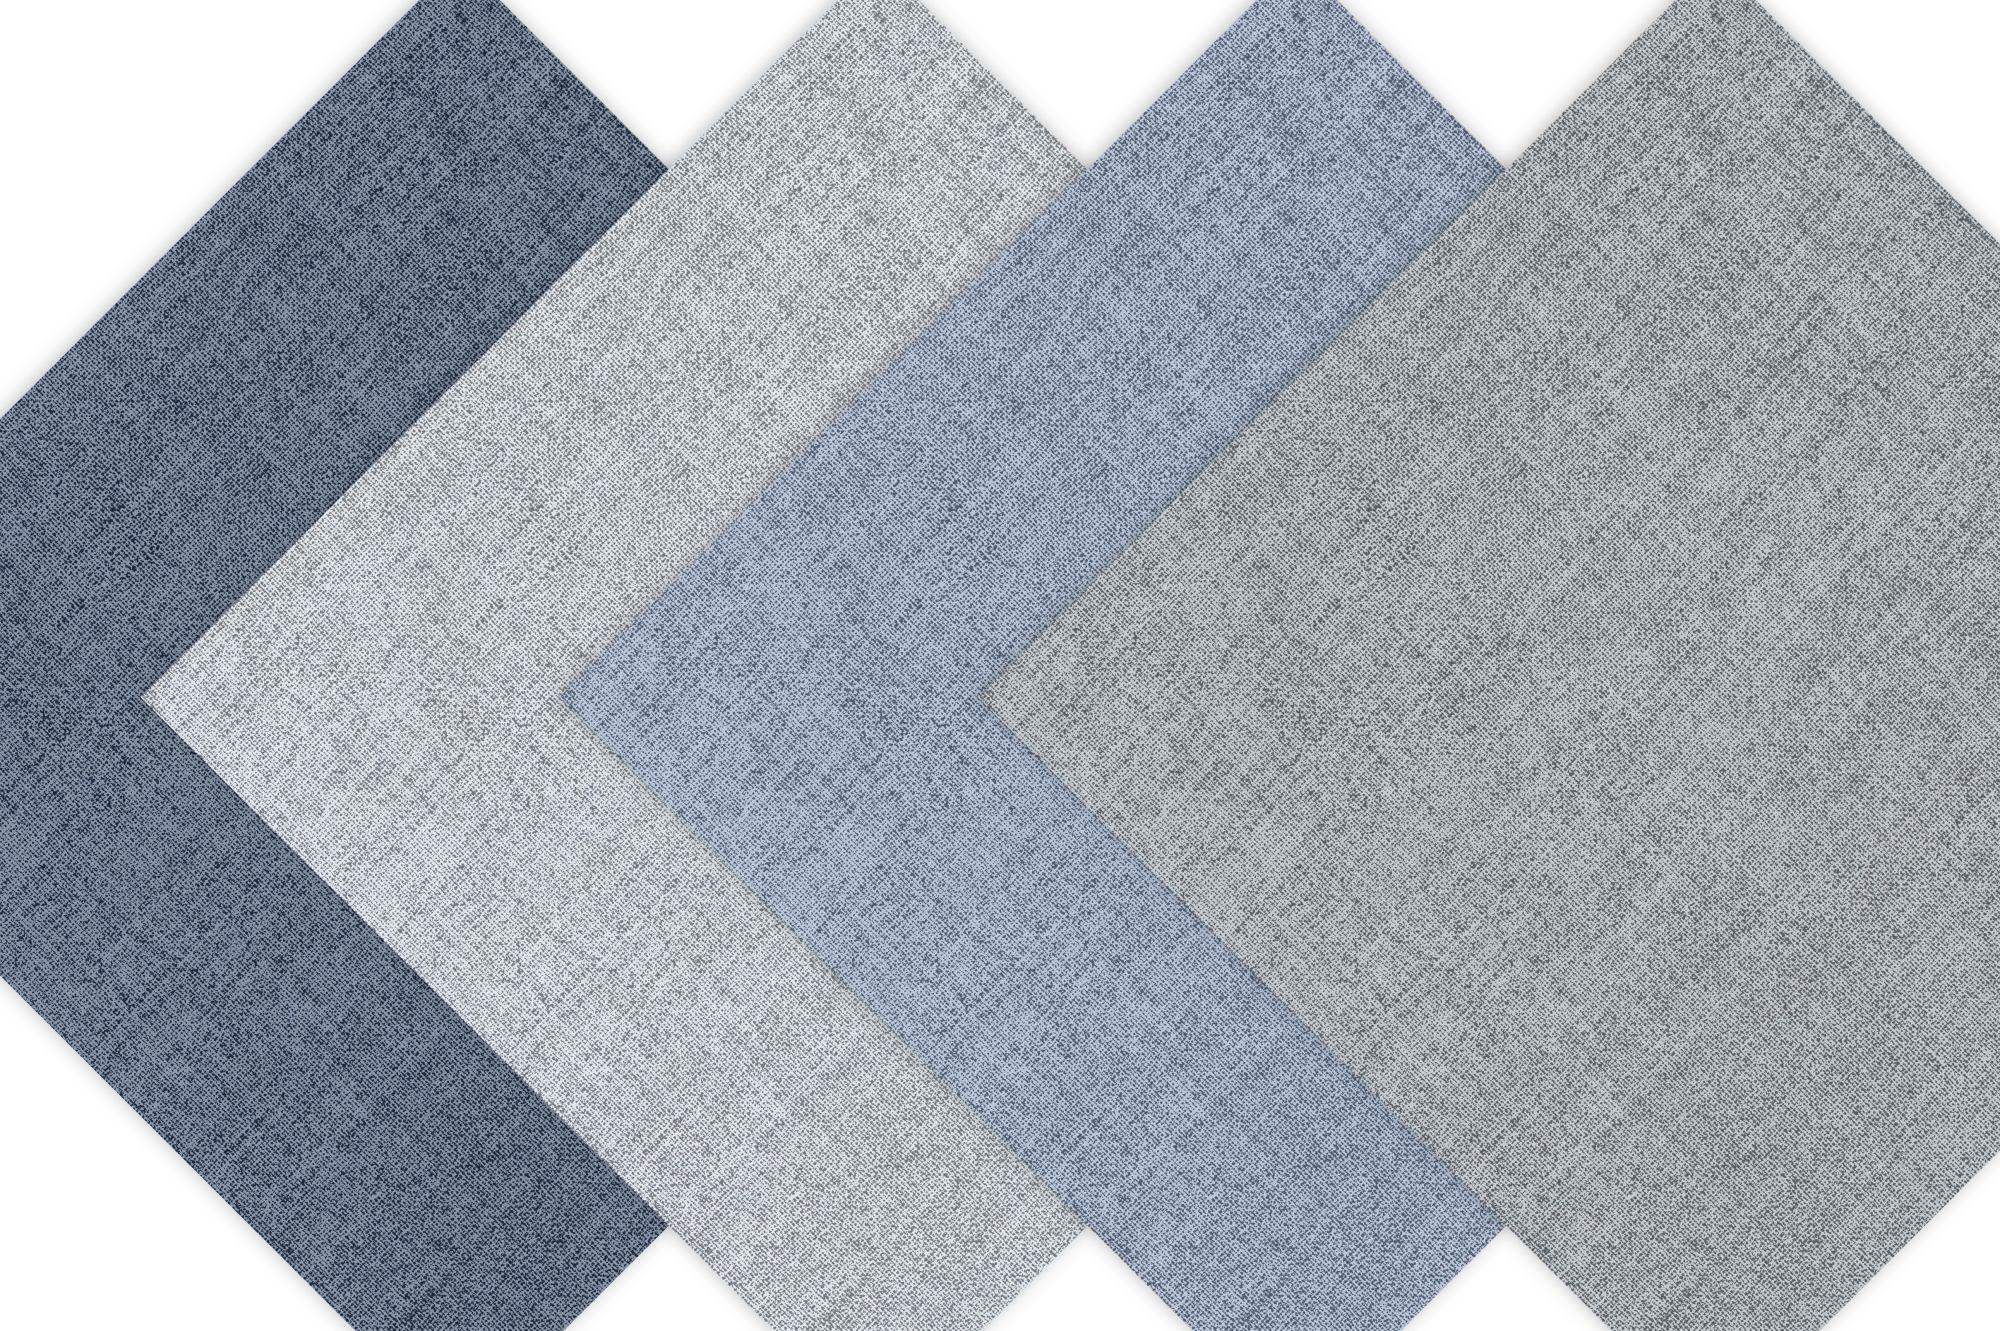 Linen Texture - Cool Hues Digital Paper example image 3